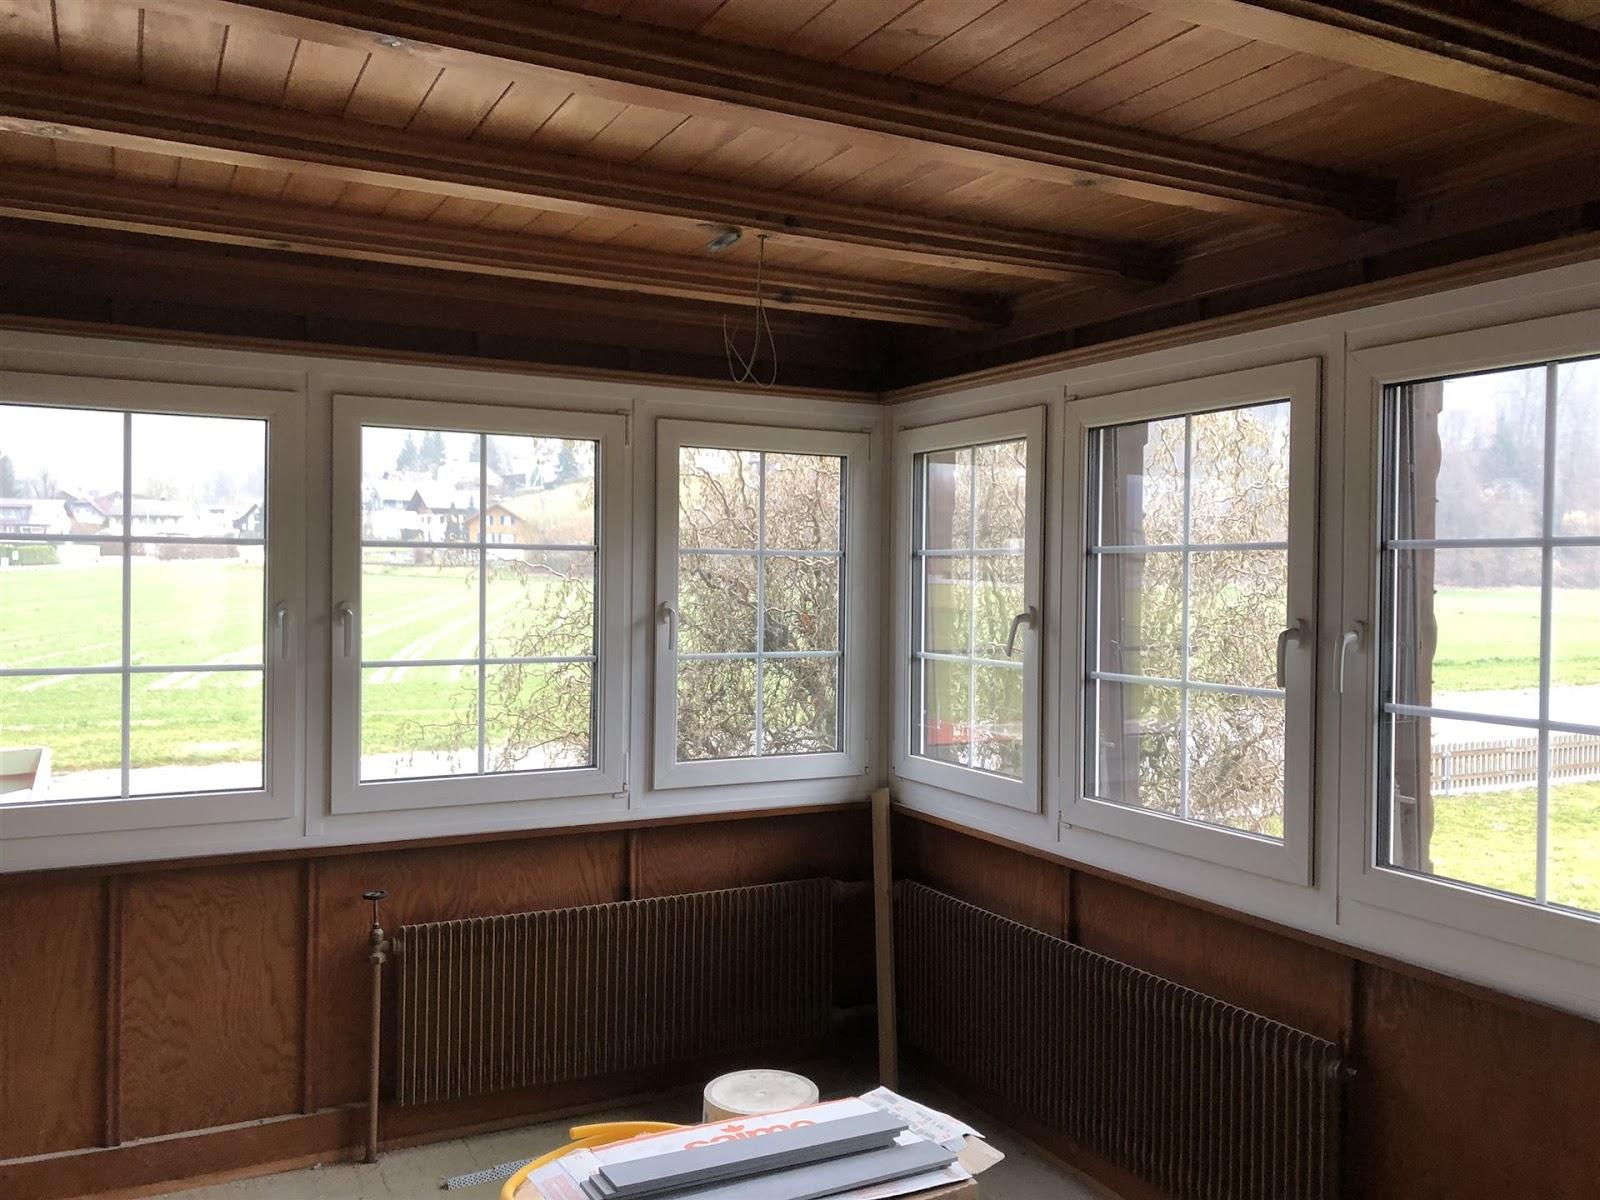 Fenster | Schibler Metallbauteile